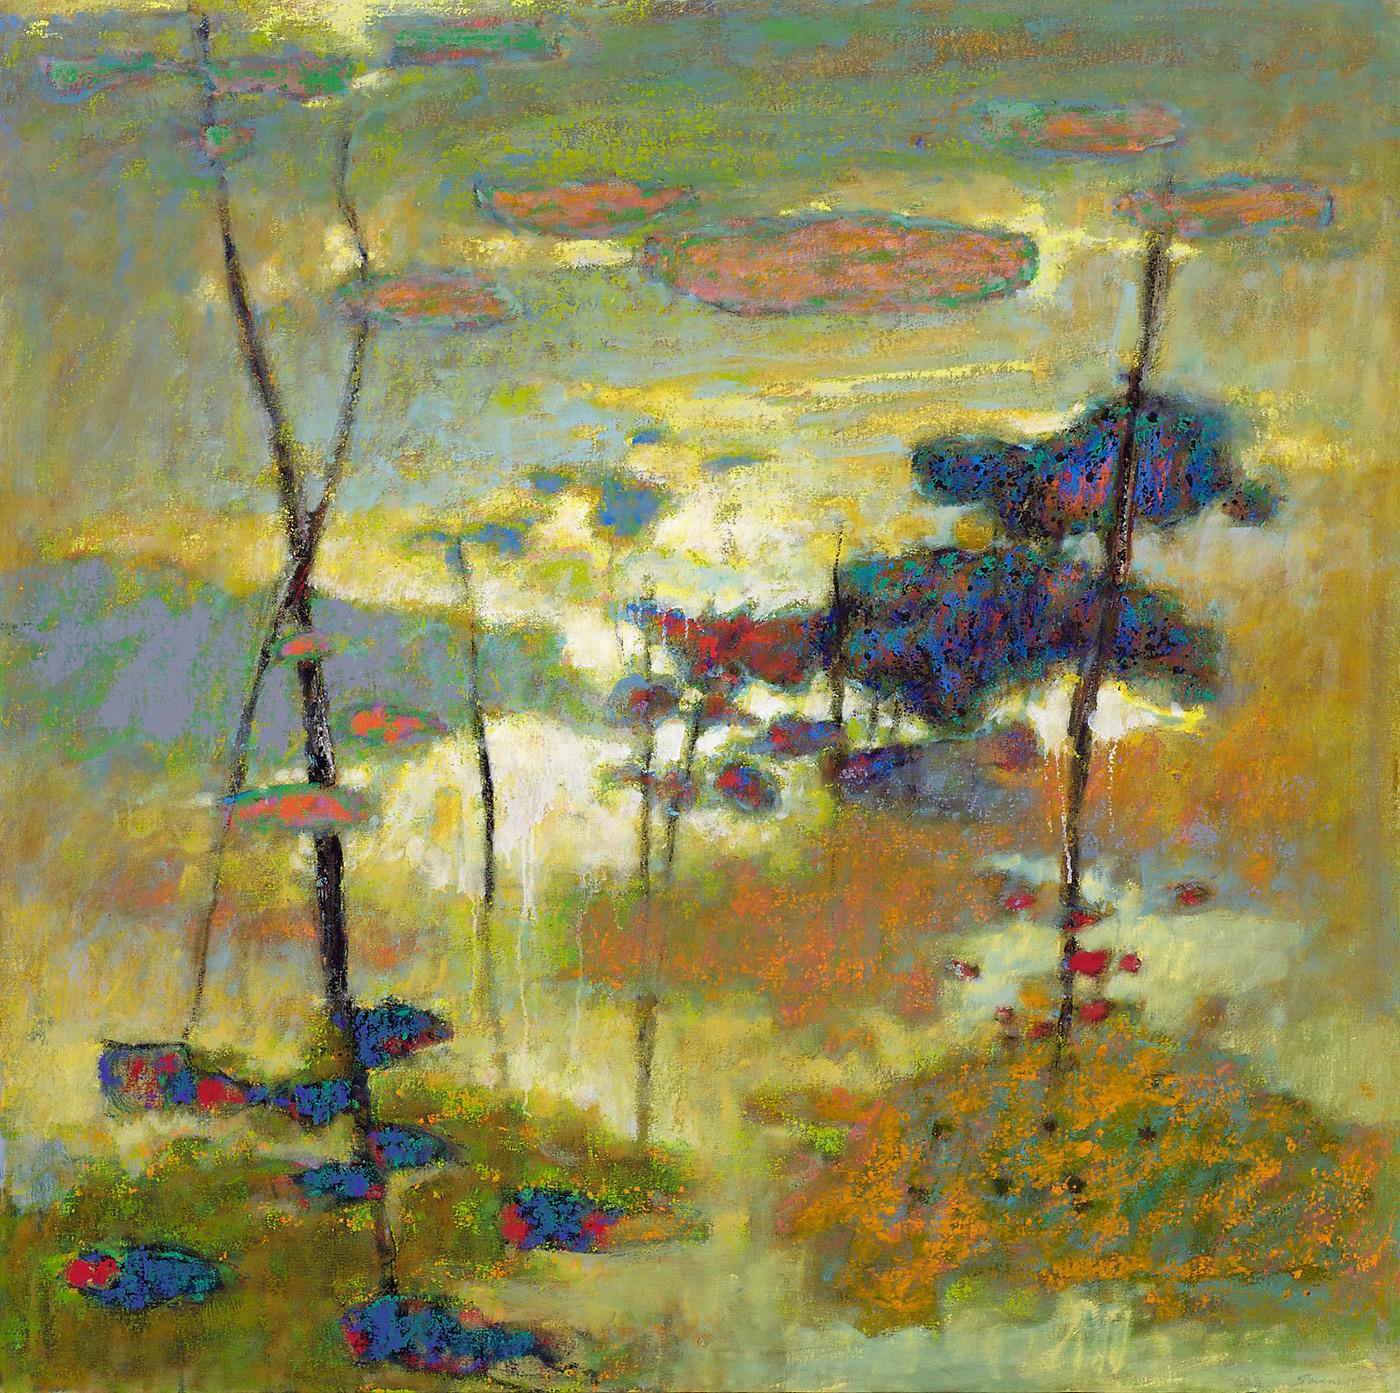 "Faraway     oil on canvas   48 x 48""   2011"